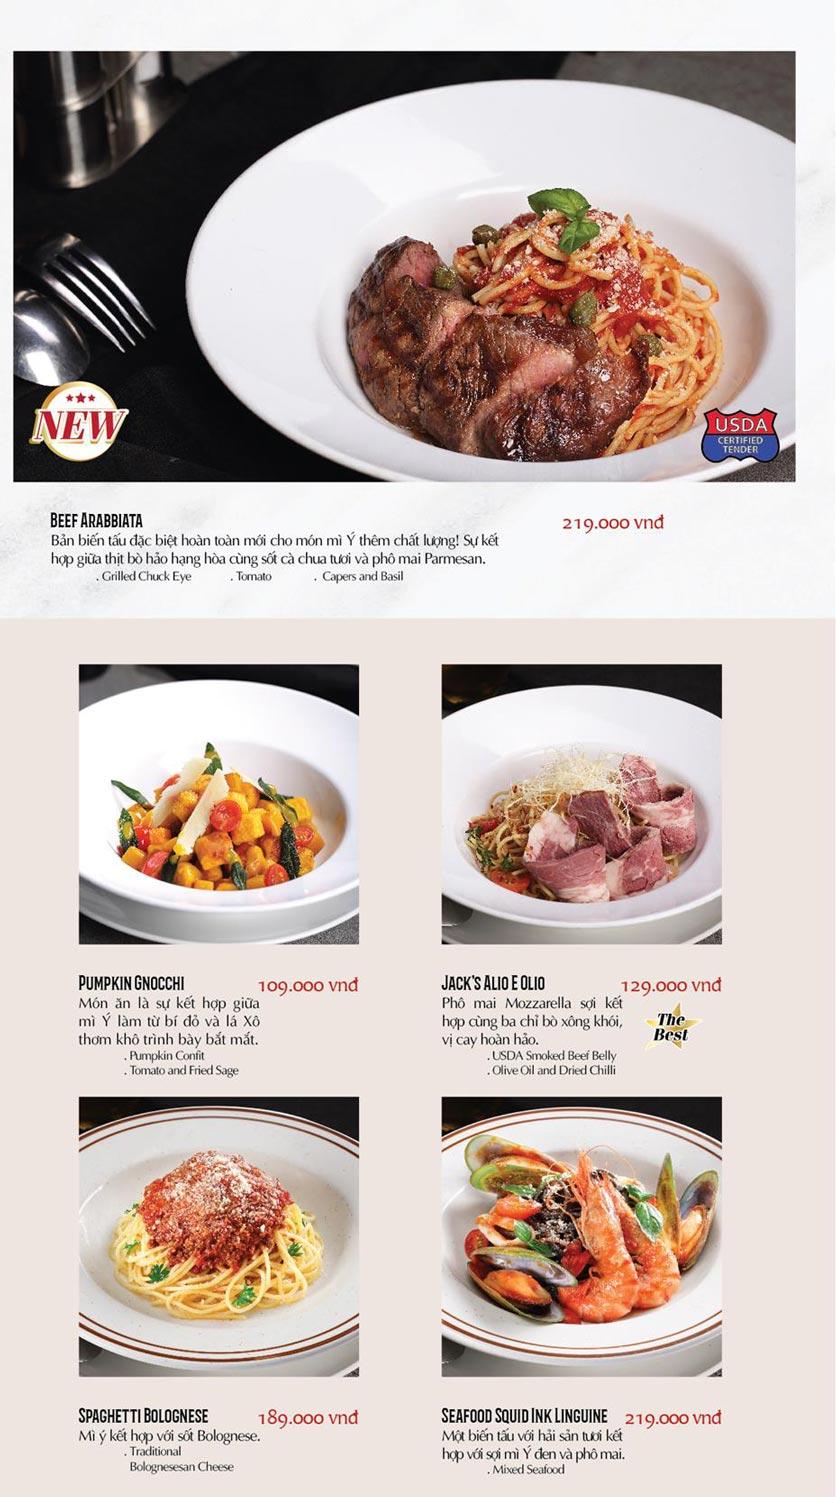 Menu Cowboy Jack's American Dining - TTTM Saigon Centre 16